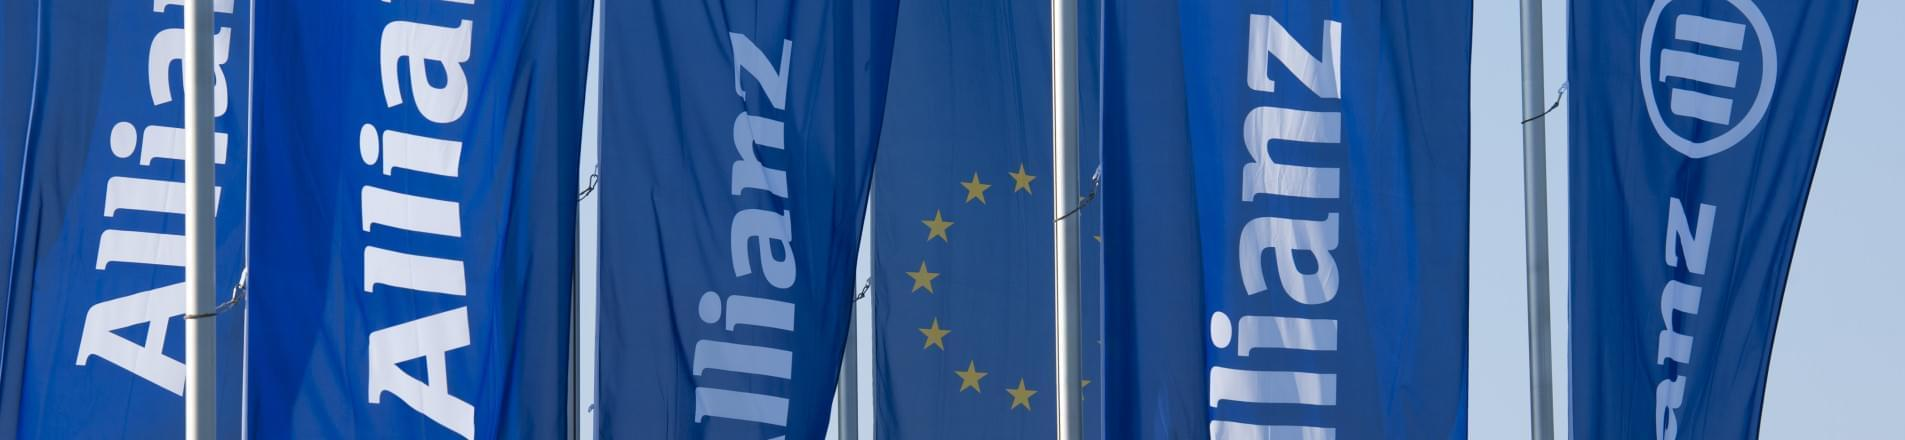 Allianz Flags